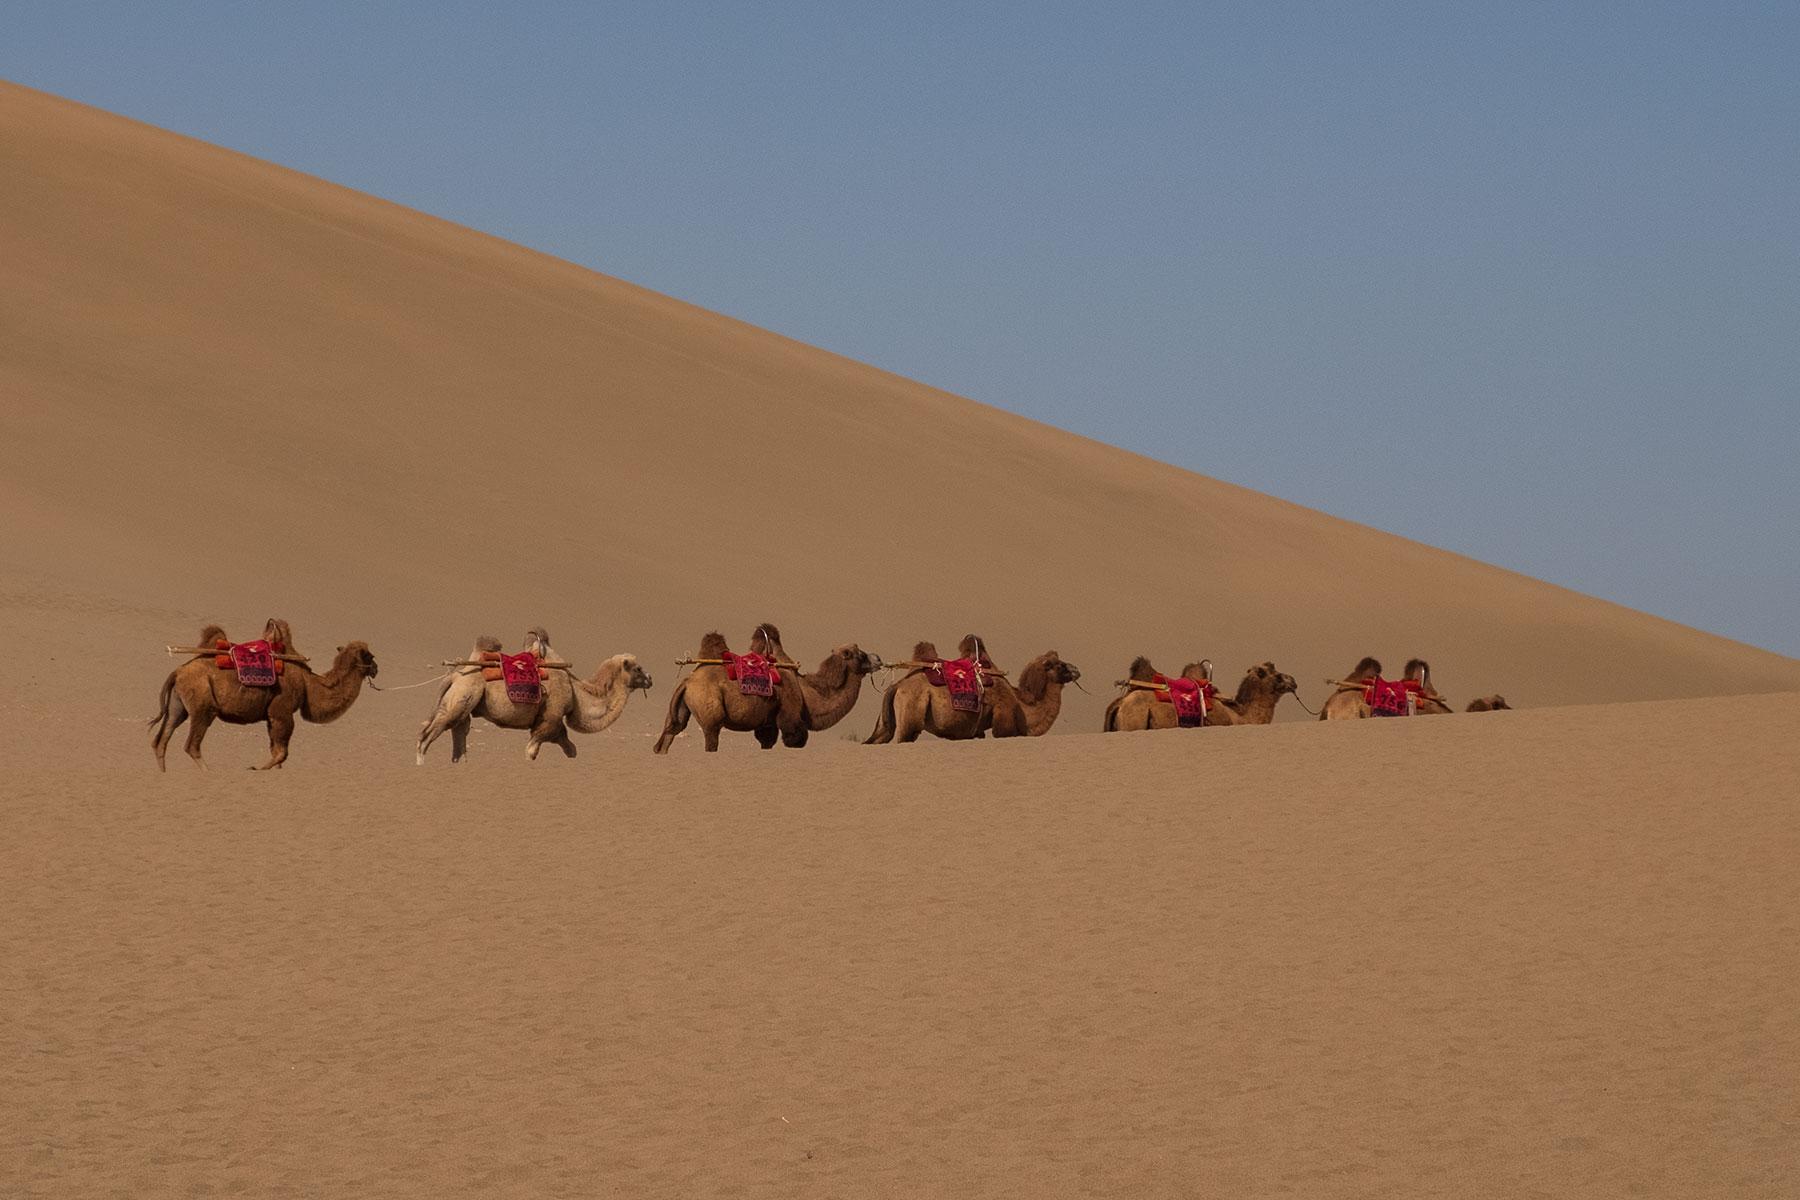 Mingsha Wüste in Dunhuang in China mit Kamelen